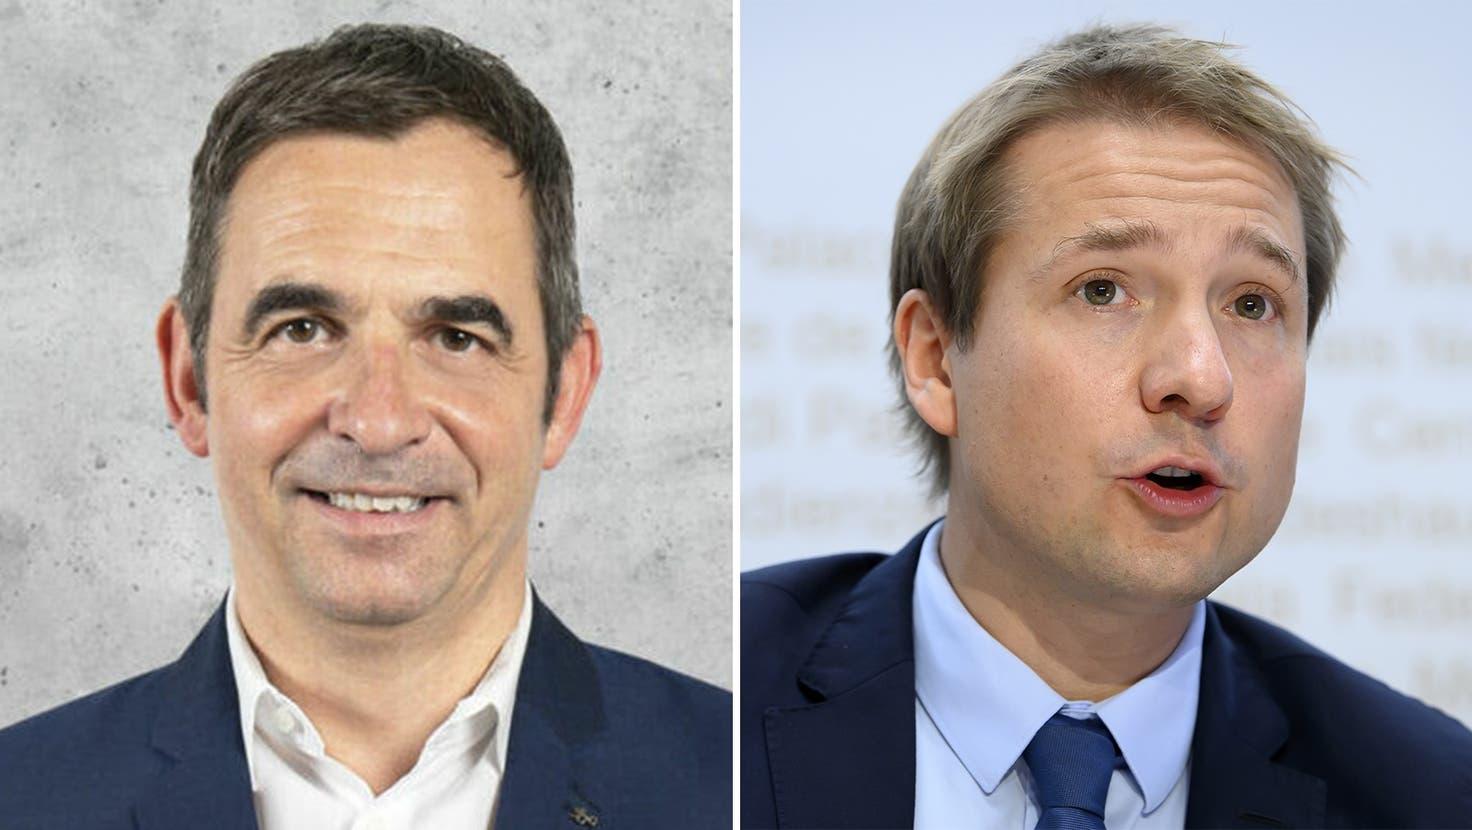 Der Bündner Jon Fanzun (links) wird neuer Generalsekretär der FDP, der Walliser Nationalrat Philippe Nantermodführt den Wahlkampf. (Keystone/Montage_CH Media)